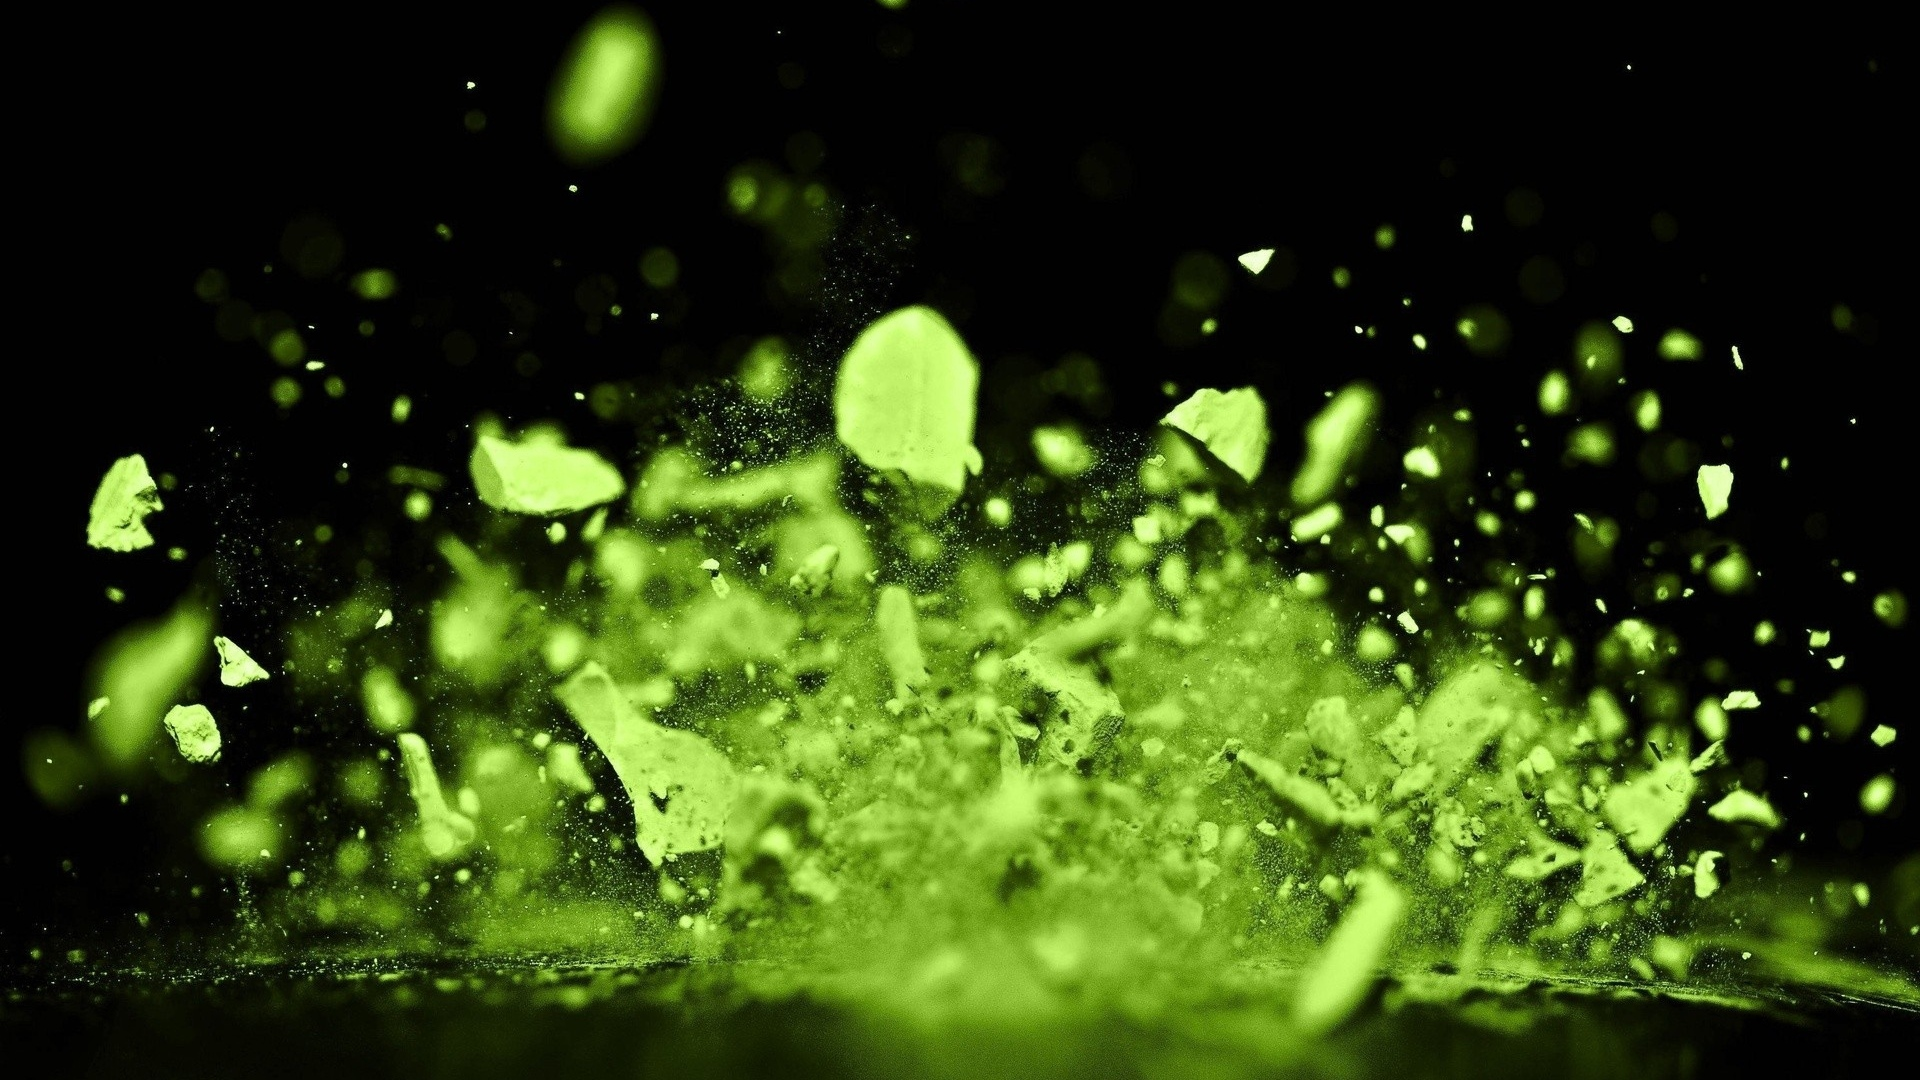 3d Liquid Abstract Wallpaper Download Wallpaper 1920x1080 Spray Debris Paint Splash